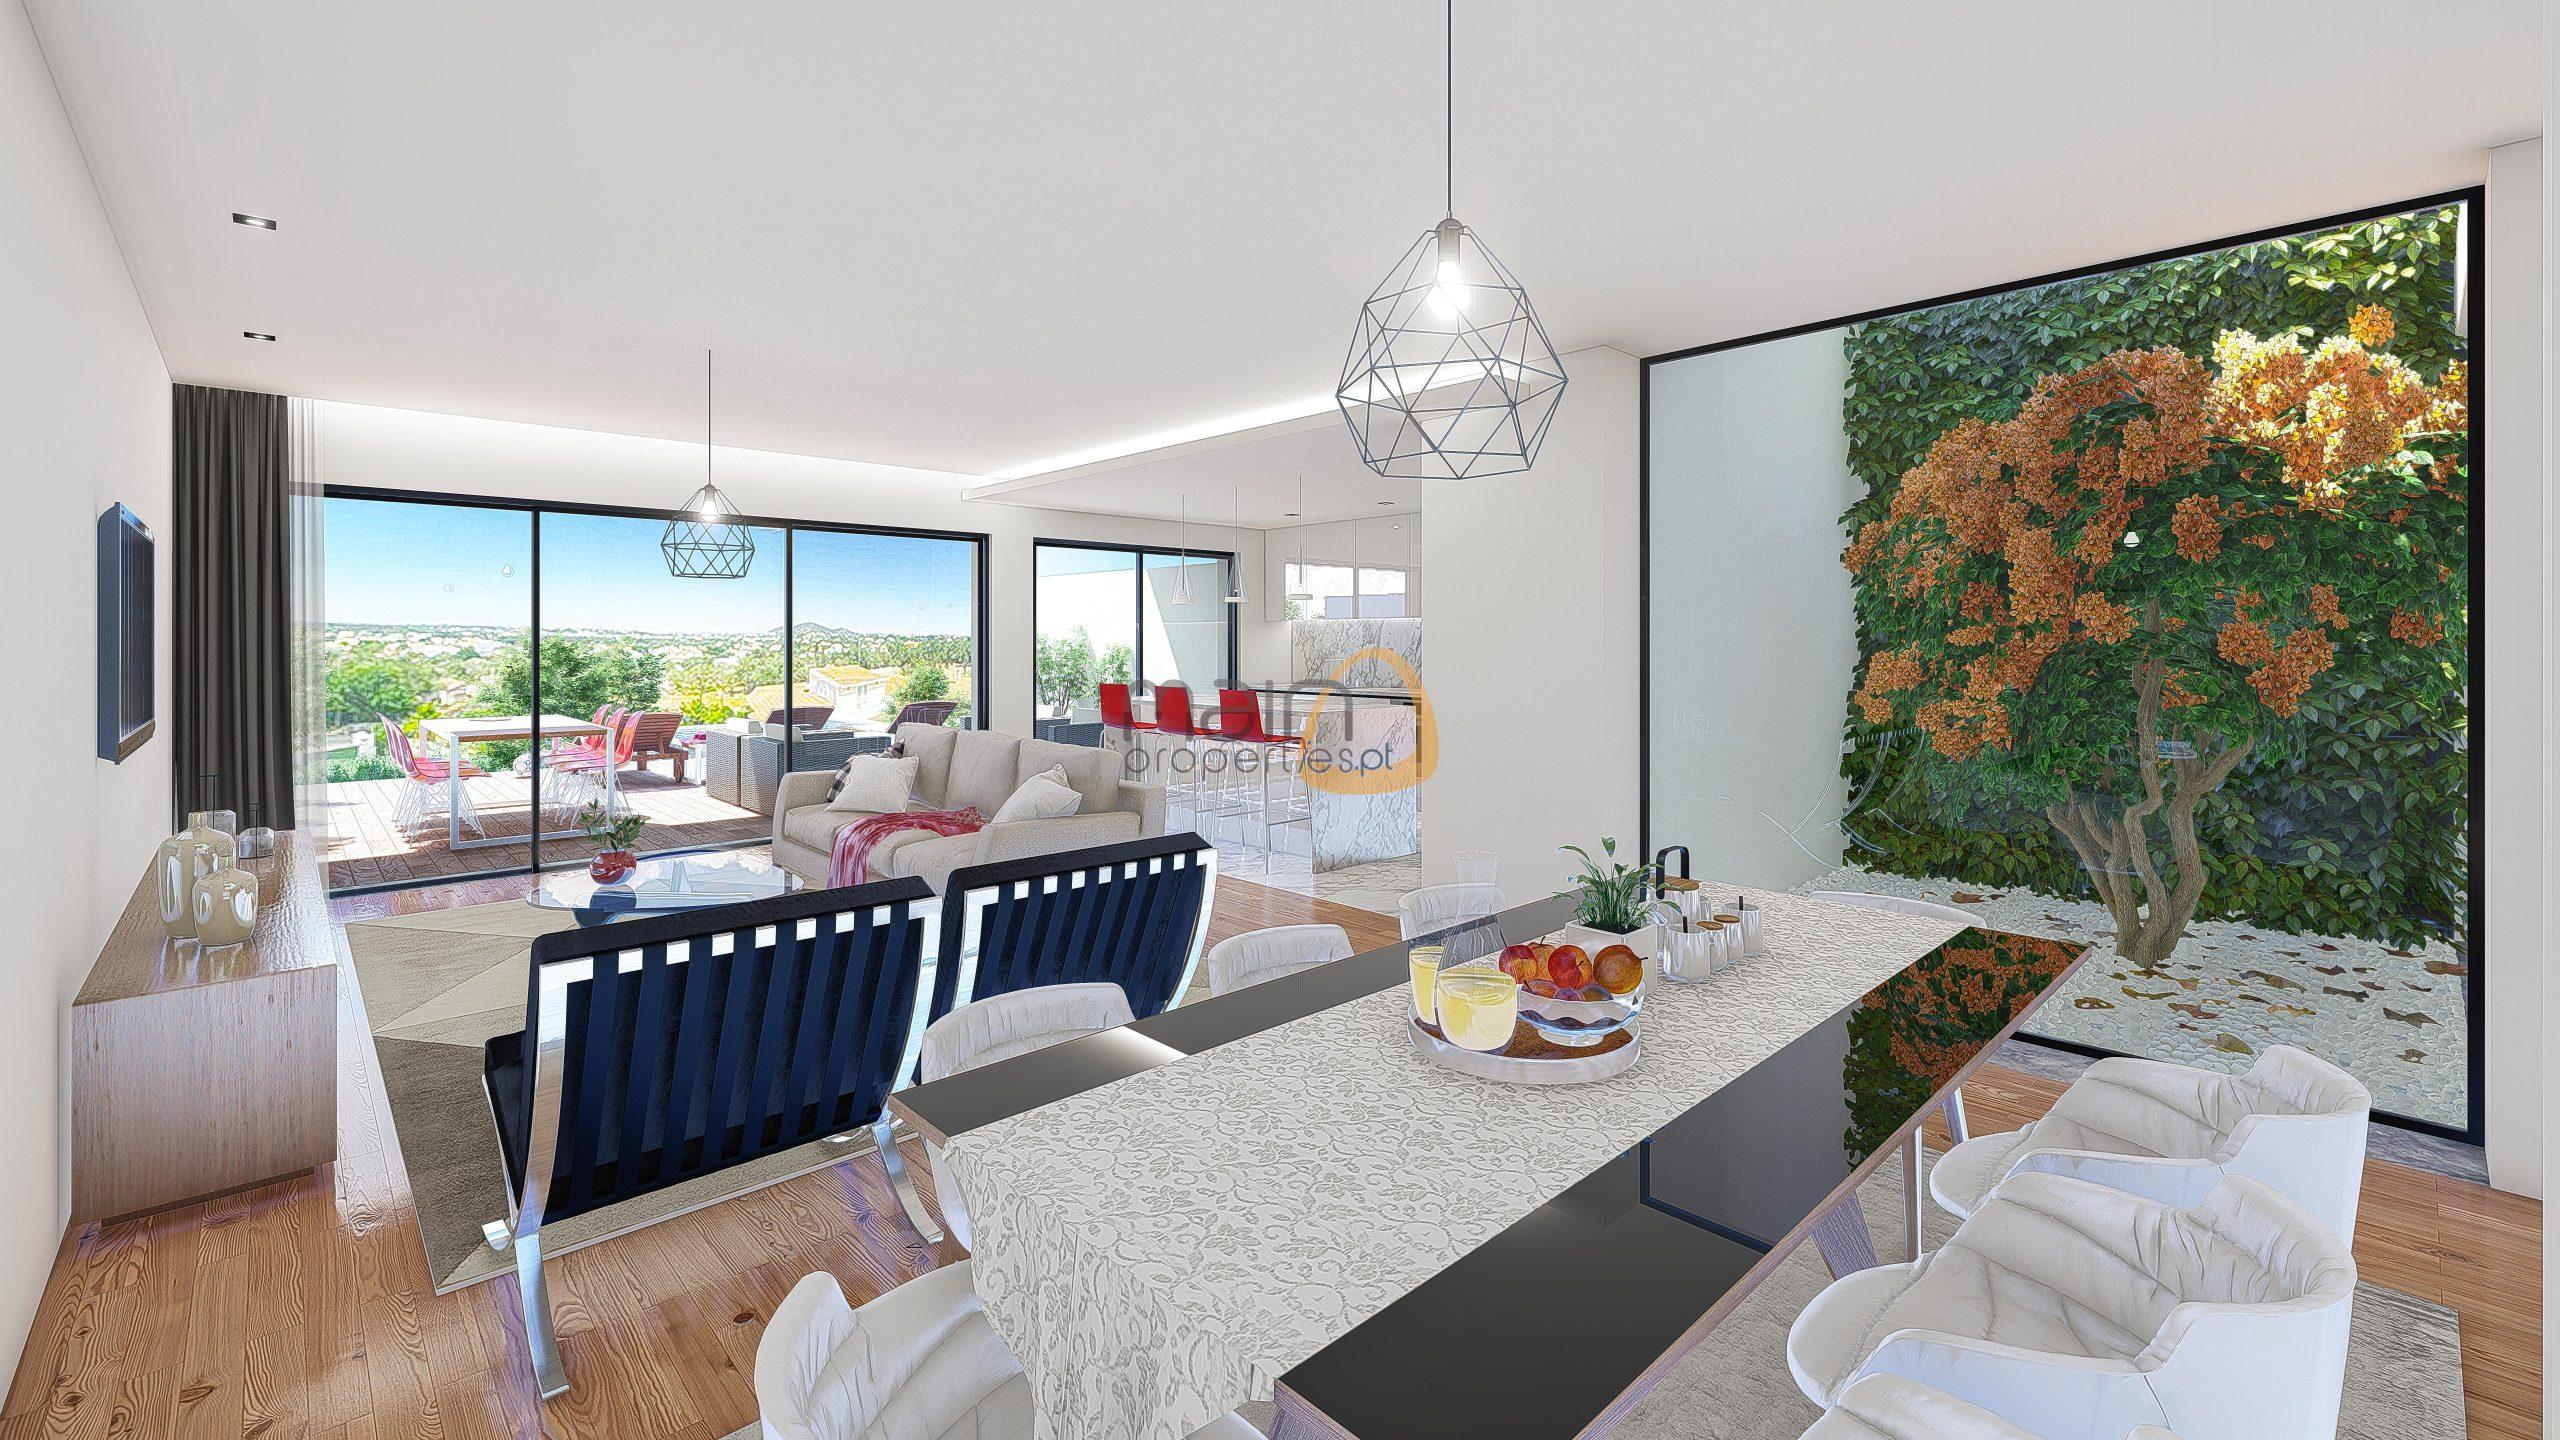 land-for-development-of-eleven-villas-with-sea-views-in-almancil-algarve-portugal-property-real-estate-12